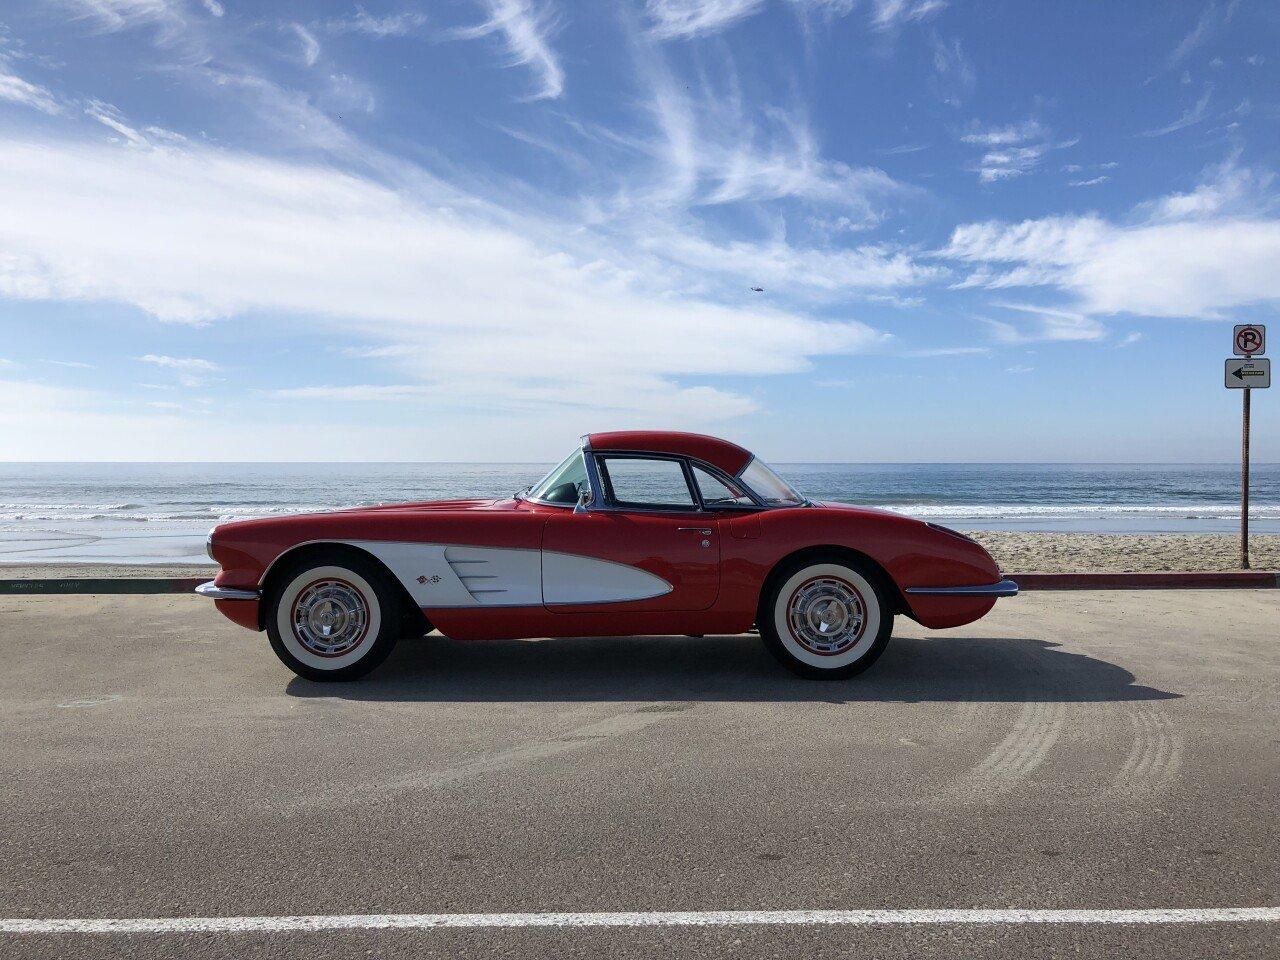 Classic Cars For Sale California Usa: 1960 Chevrolet Corvette Convertible For Sale Near San